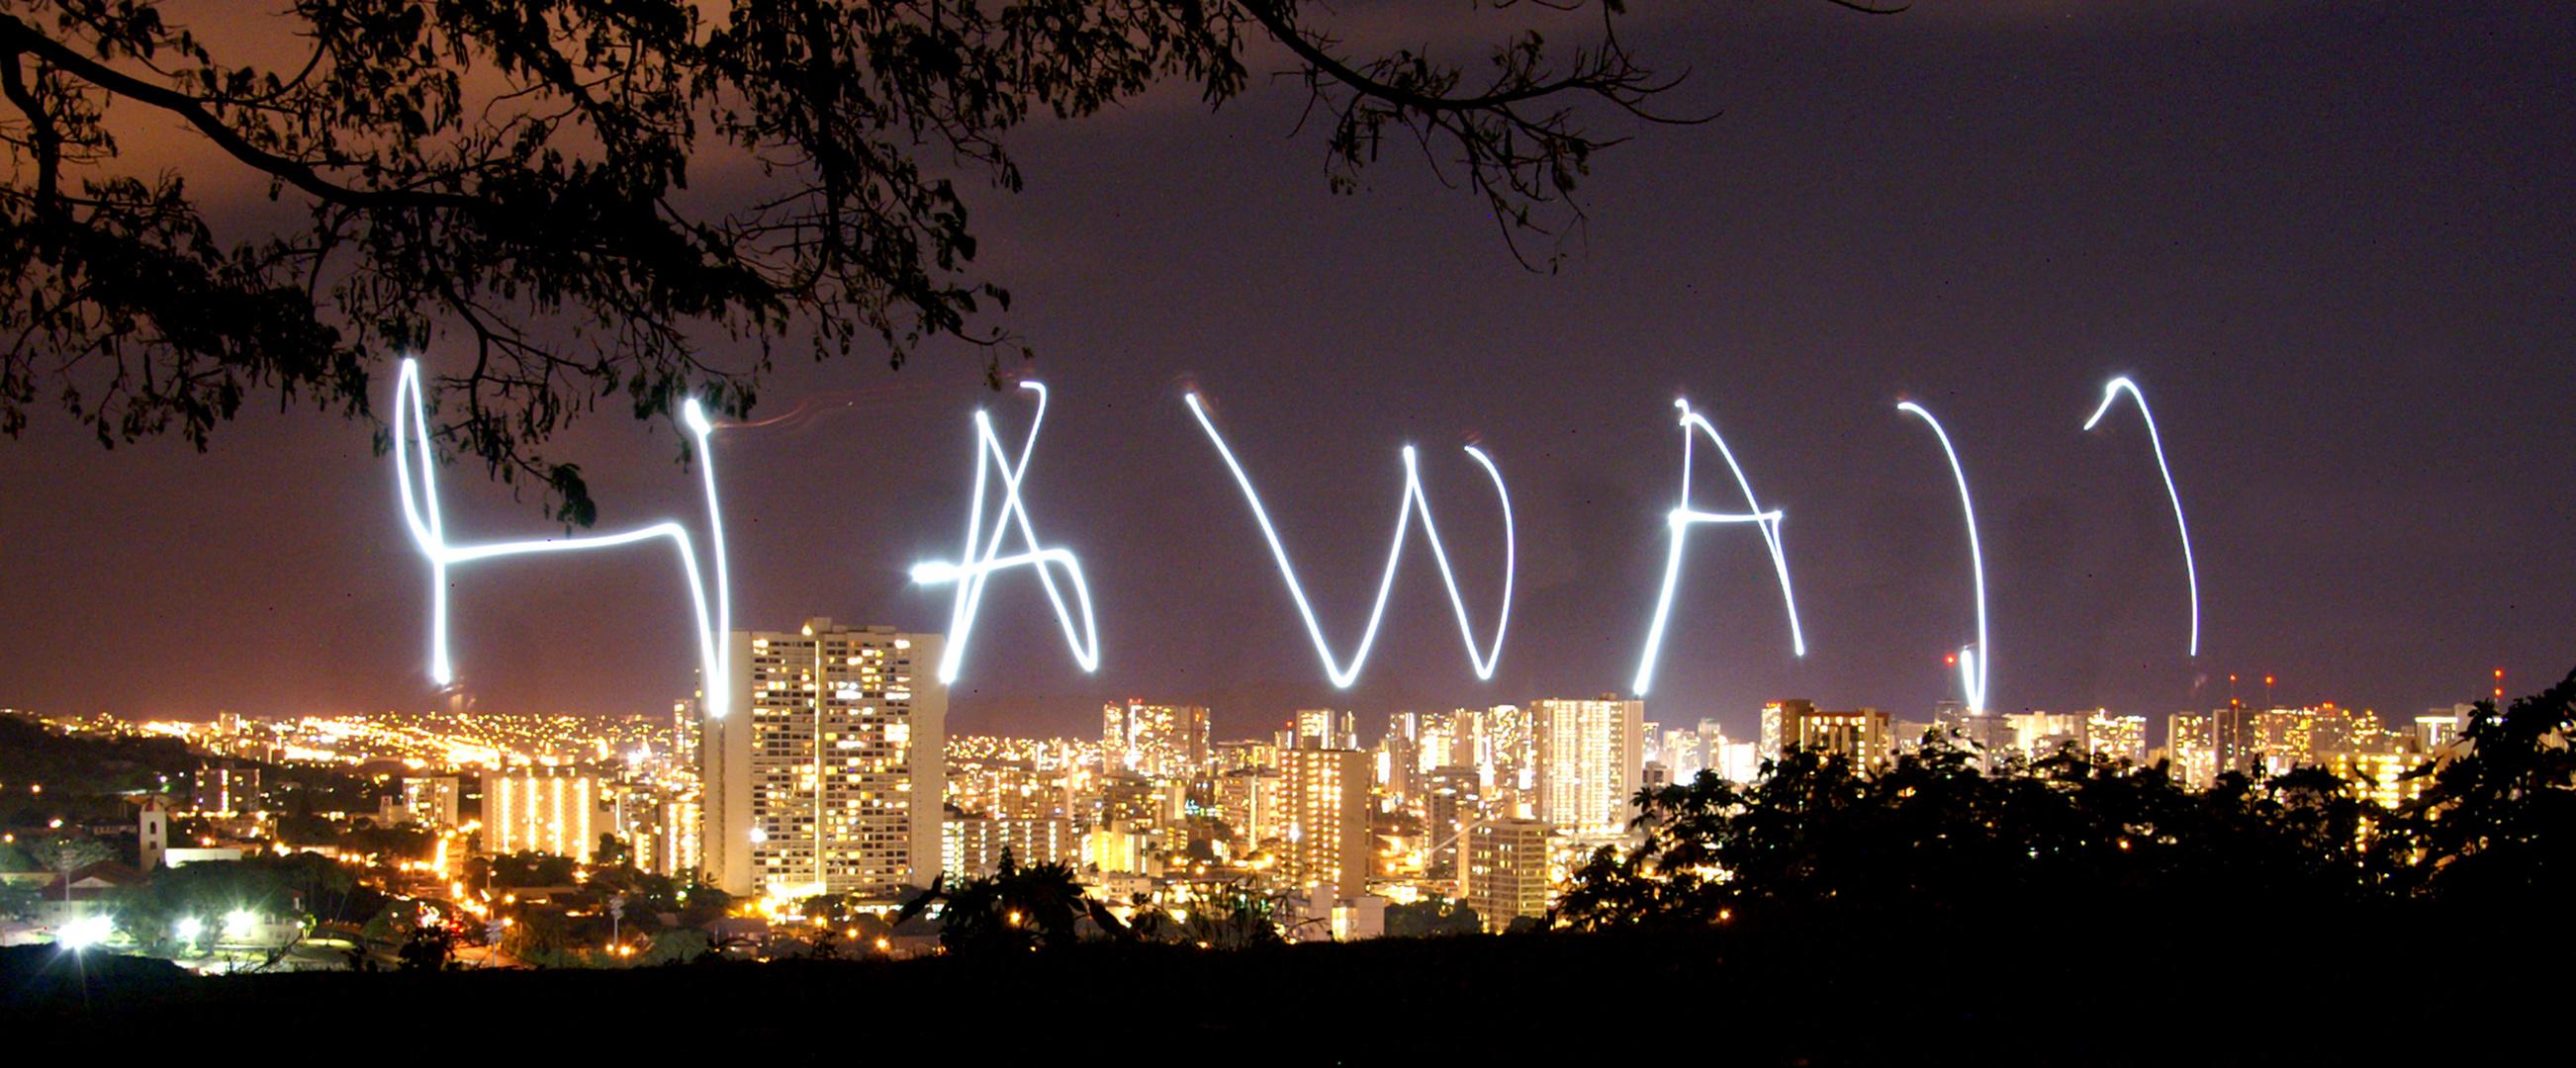 Honolulu bye night